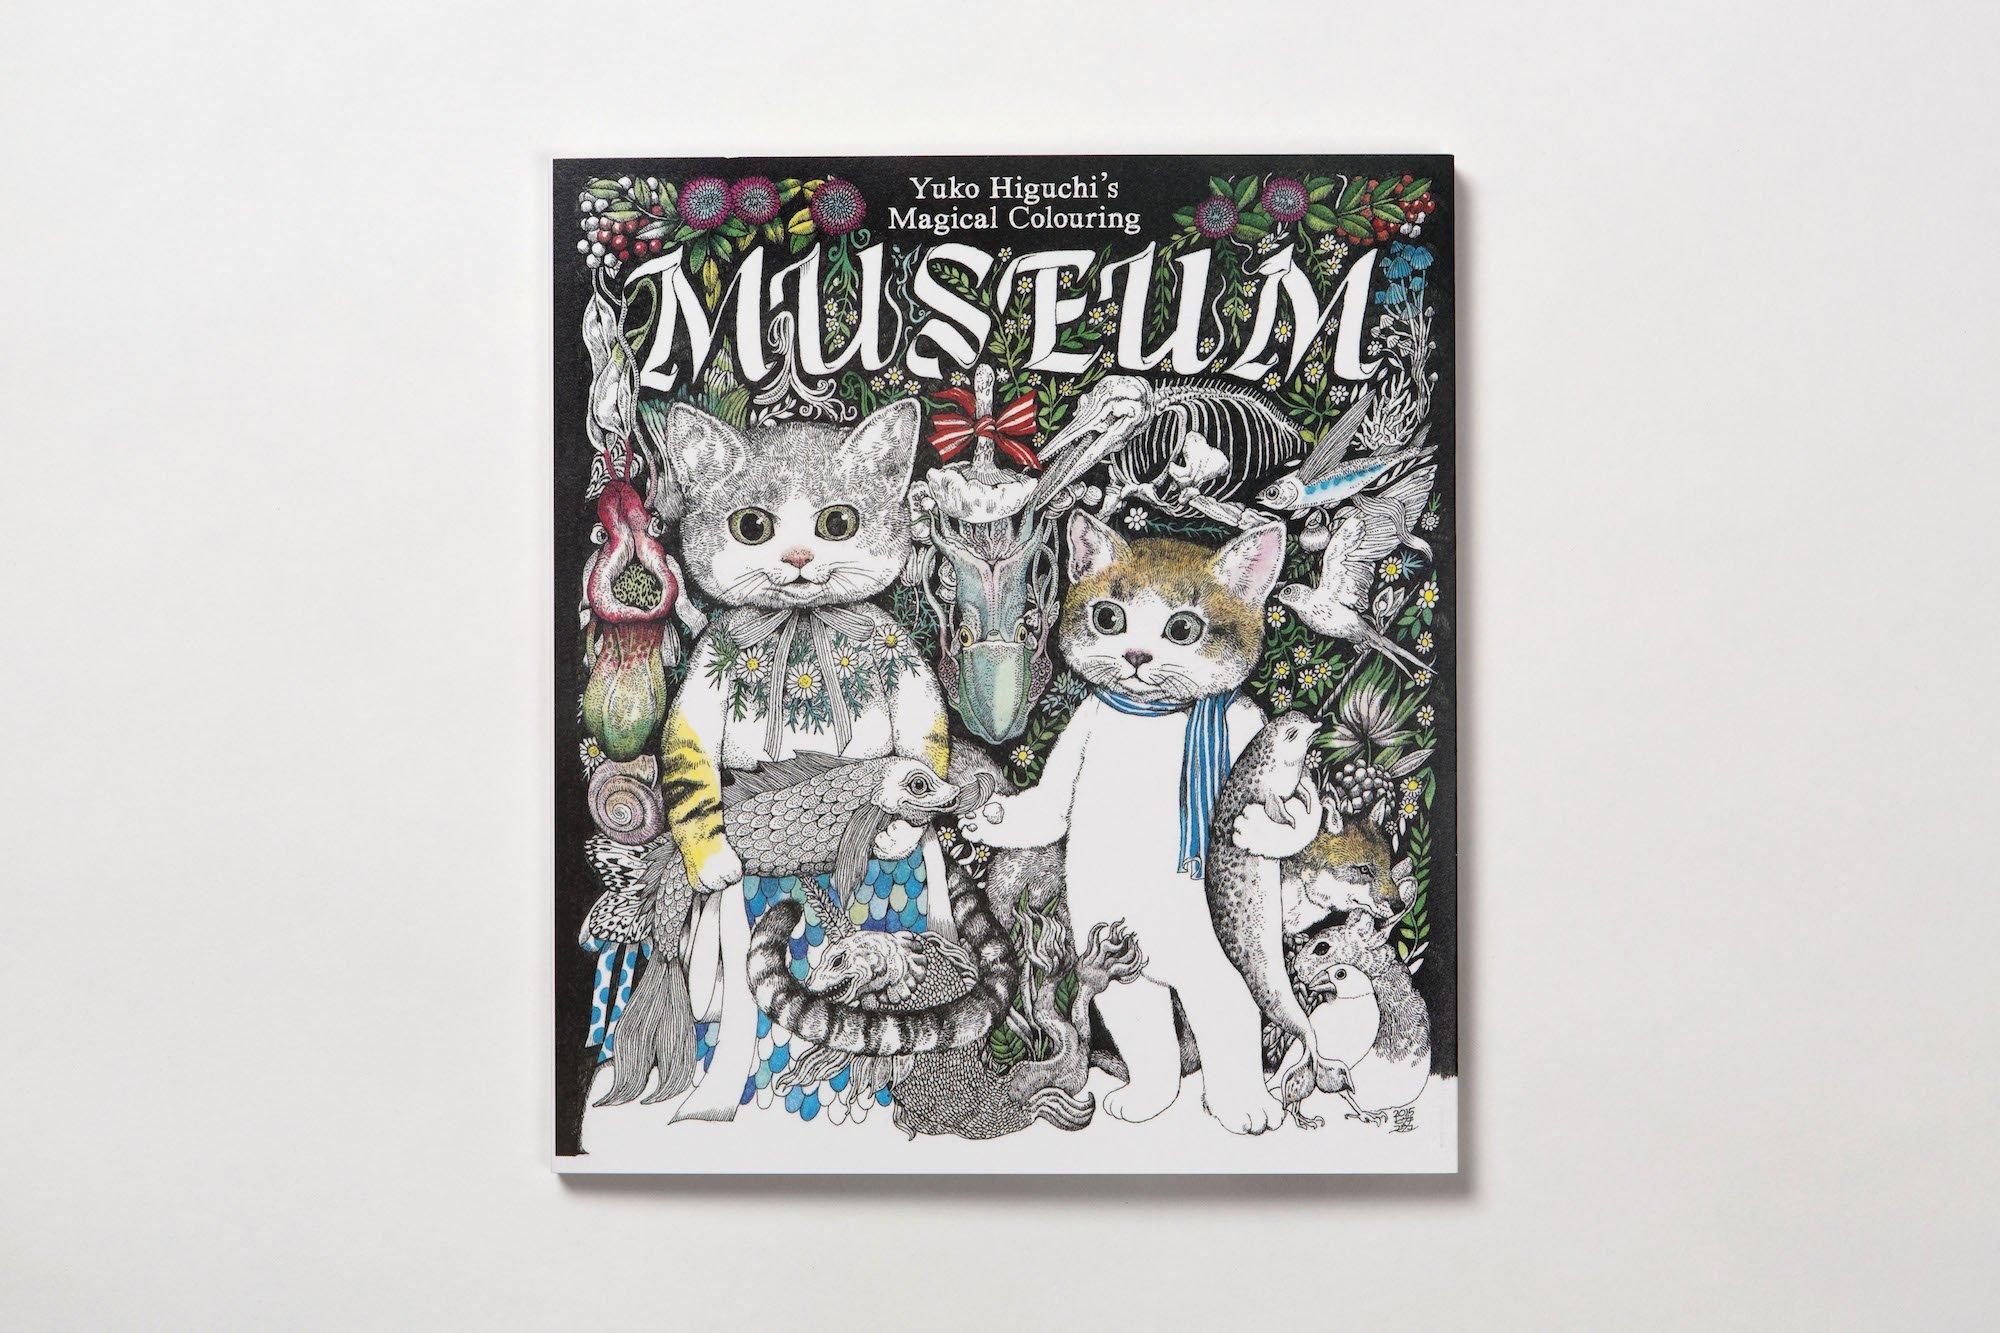 Yuko Higuchi Magical Colouring Museum